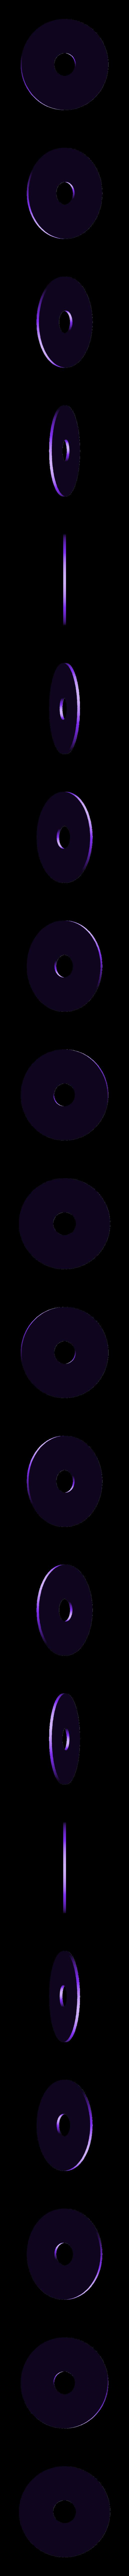 washer_32x1.0mm.stl Download free STL file PISTOL VR magnetic gunstock Oculus Rift-S Quest • 3D printer template, danielschweinert